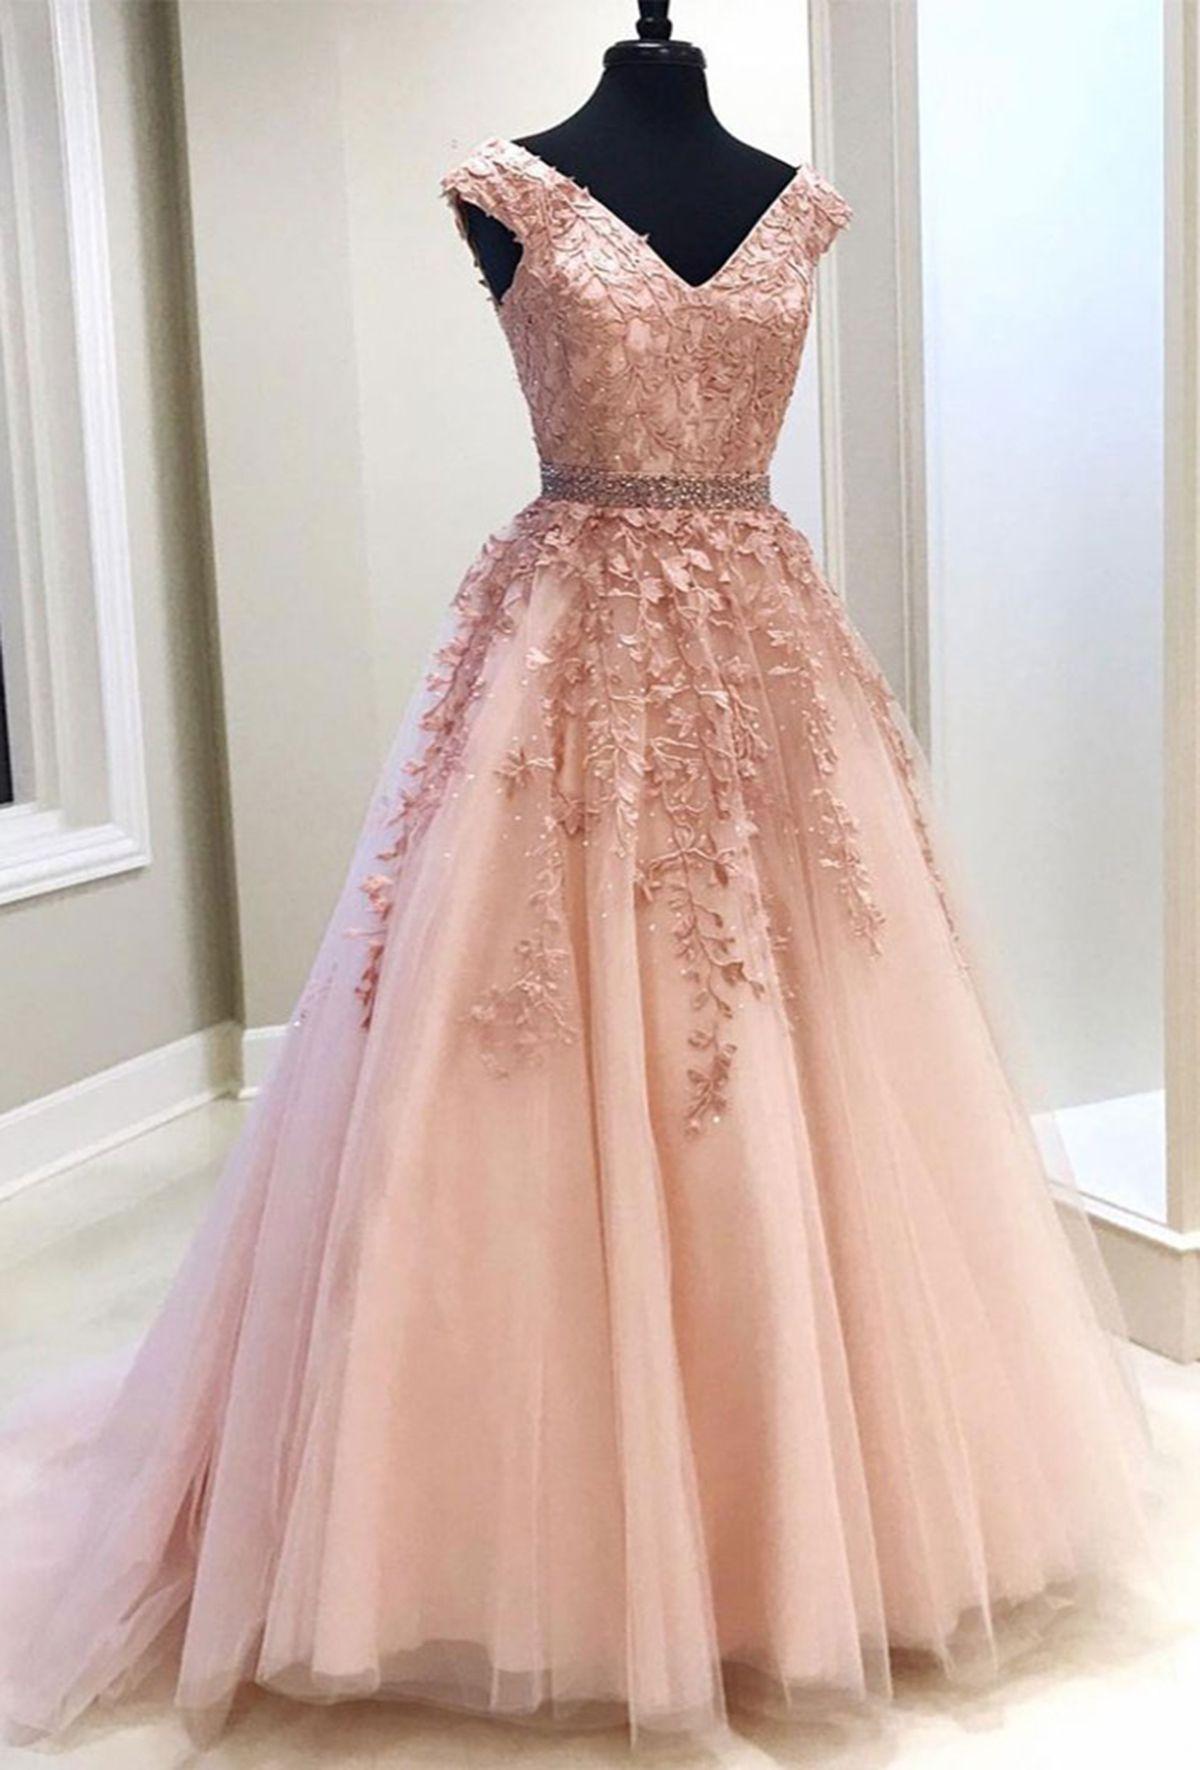 Senior Year Prom Dresses Pink